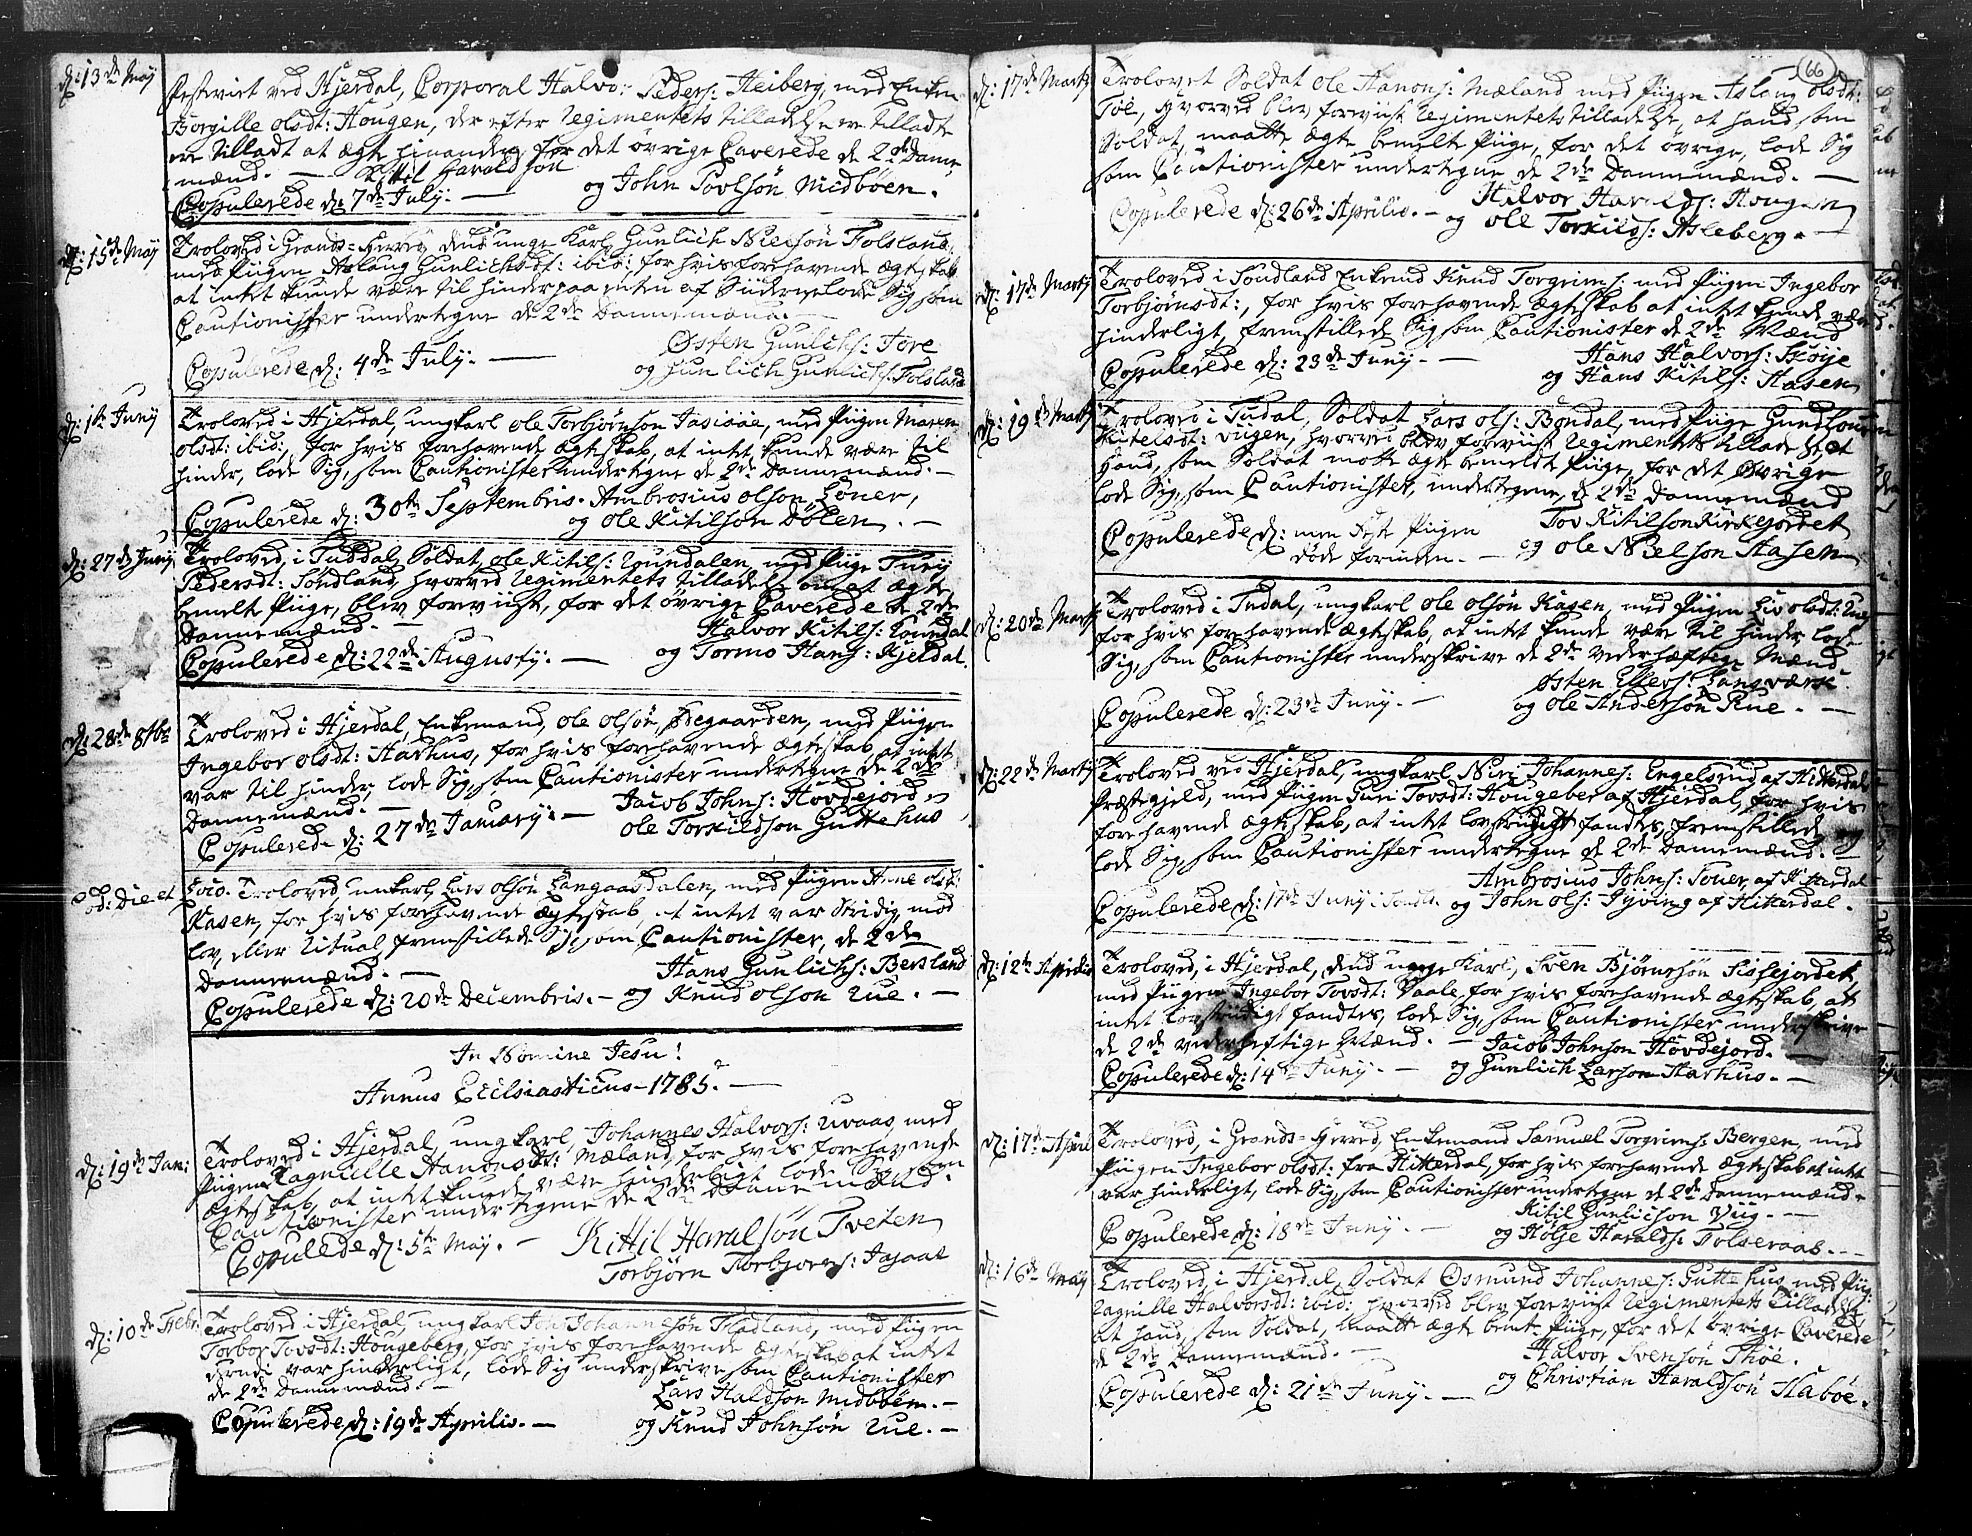 SAKO, Hjartdal kirkebøker, F/Fa/L0004: Ministerialbok nr. I 4, 1727-1795, s. 66